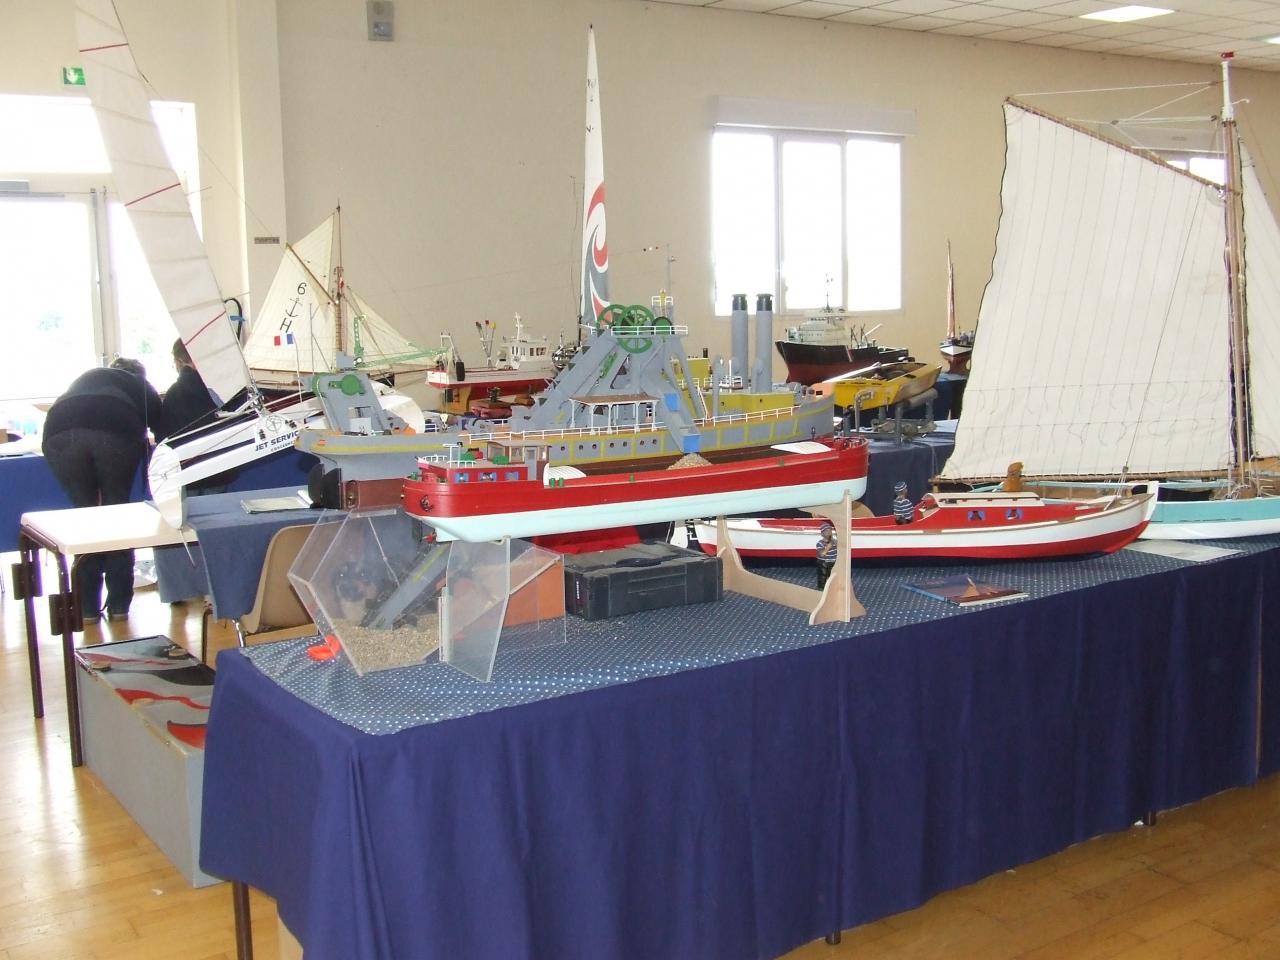 les bateaux de jean bernard